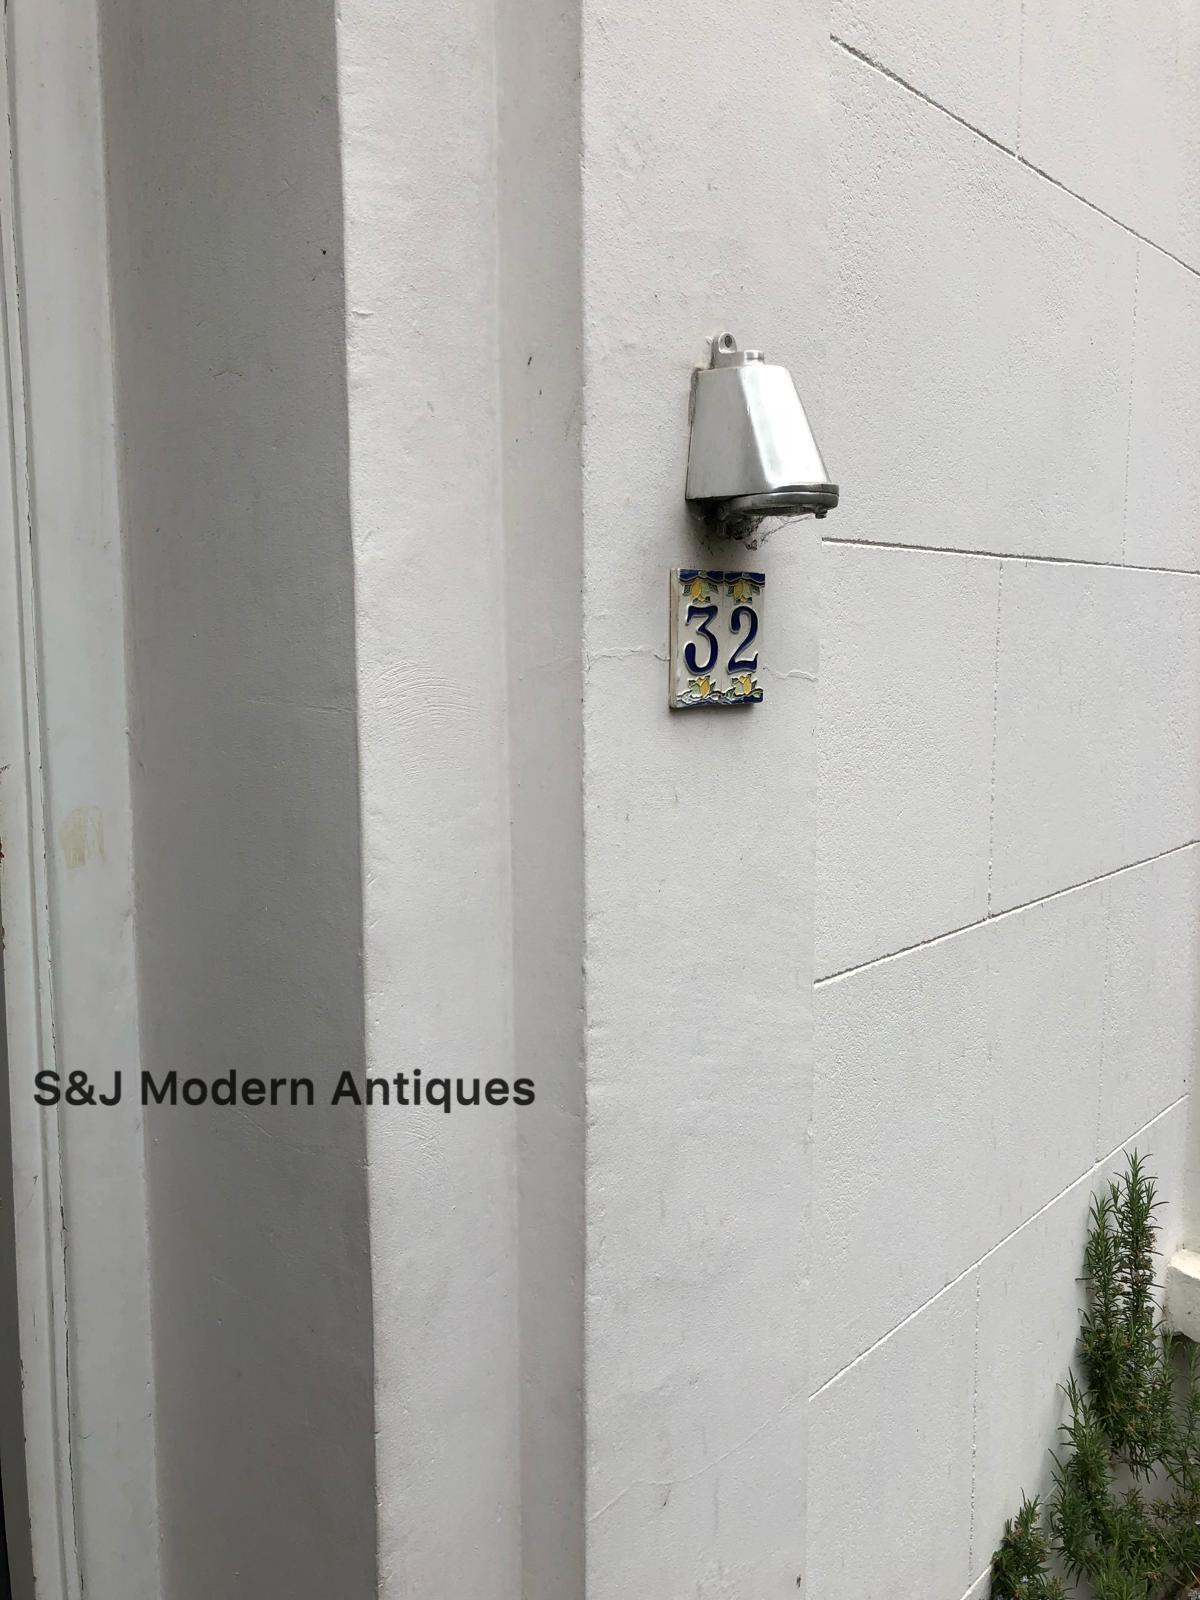 Davey & Co PARATIA Industriale Luce Parete Vintage Antico Lampada Lampada Lampada da nave in ottone oro 4dc7d4